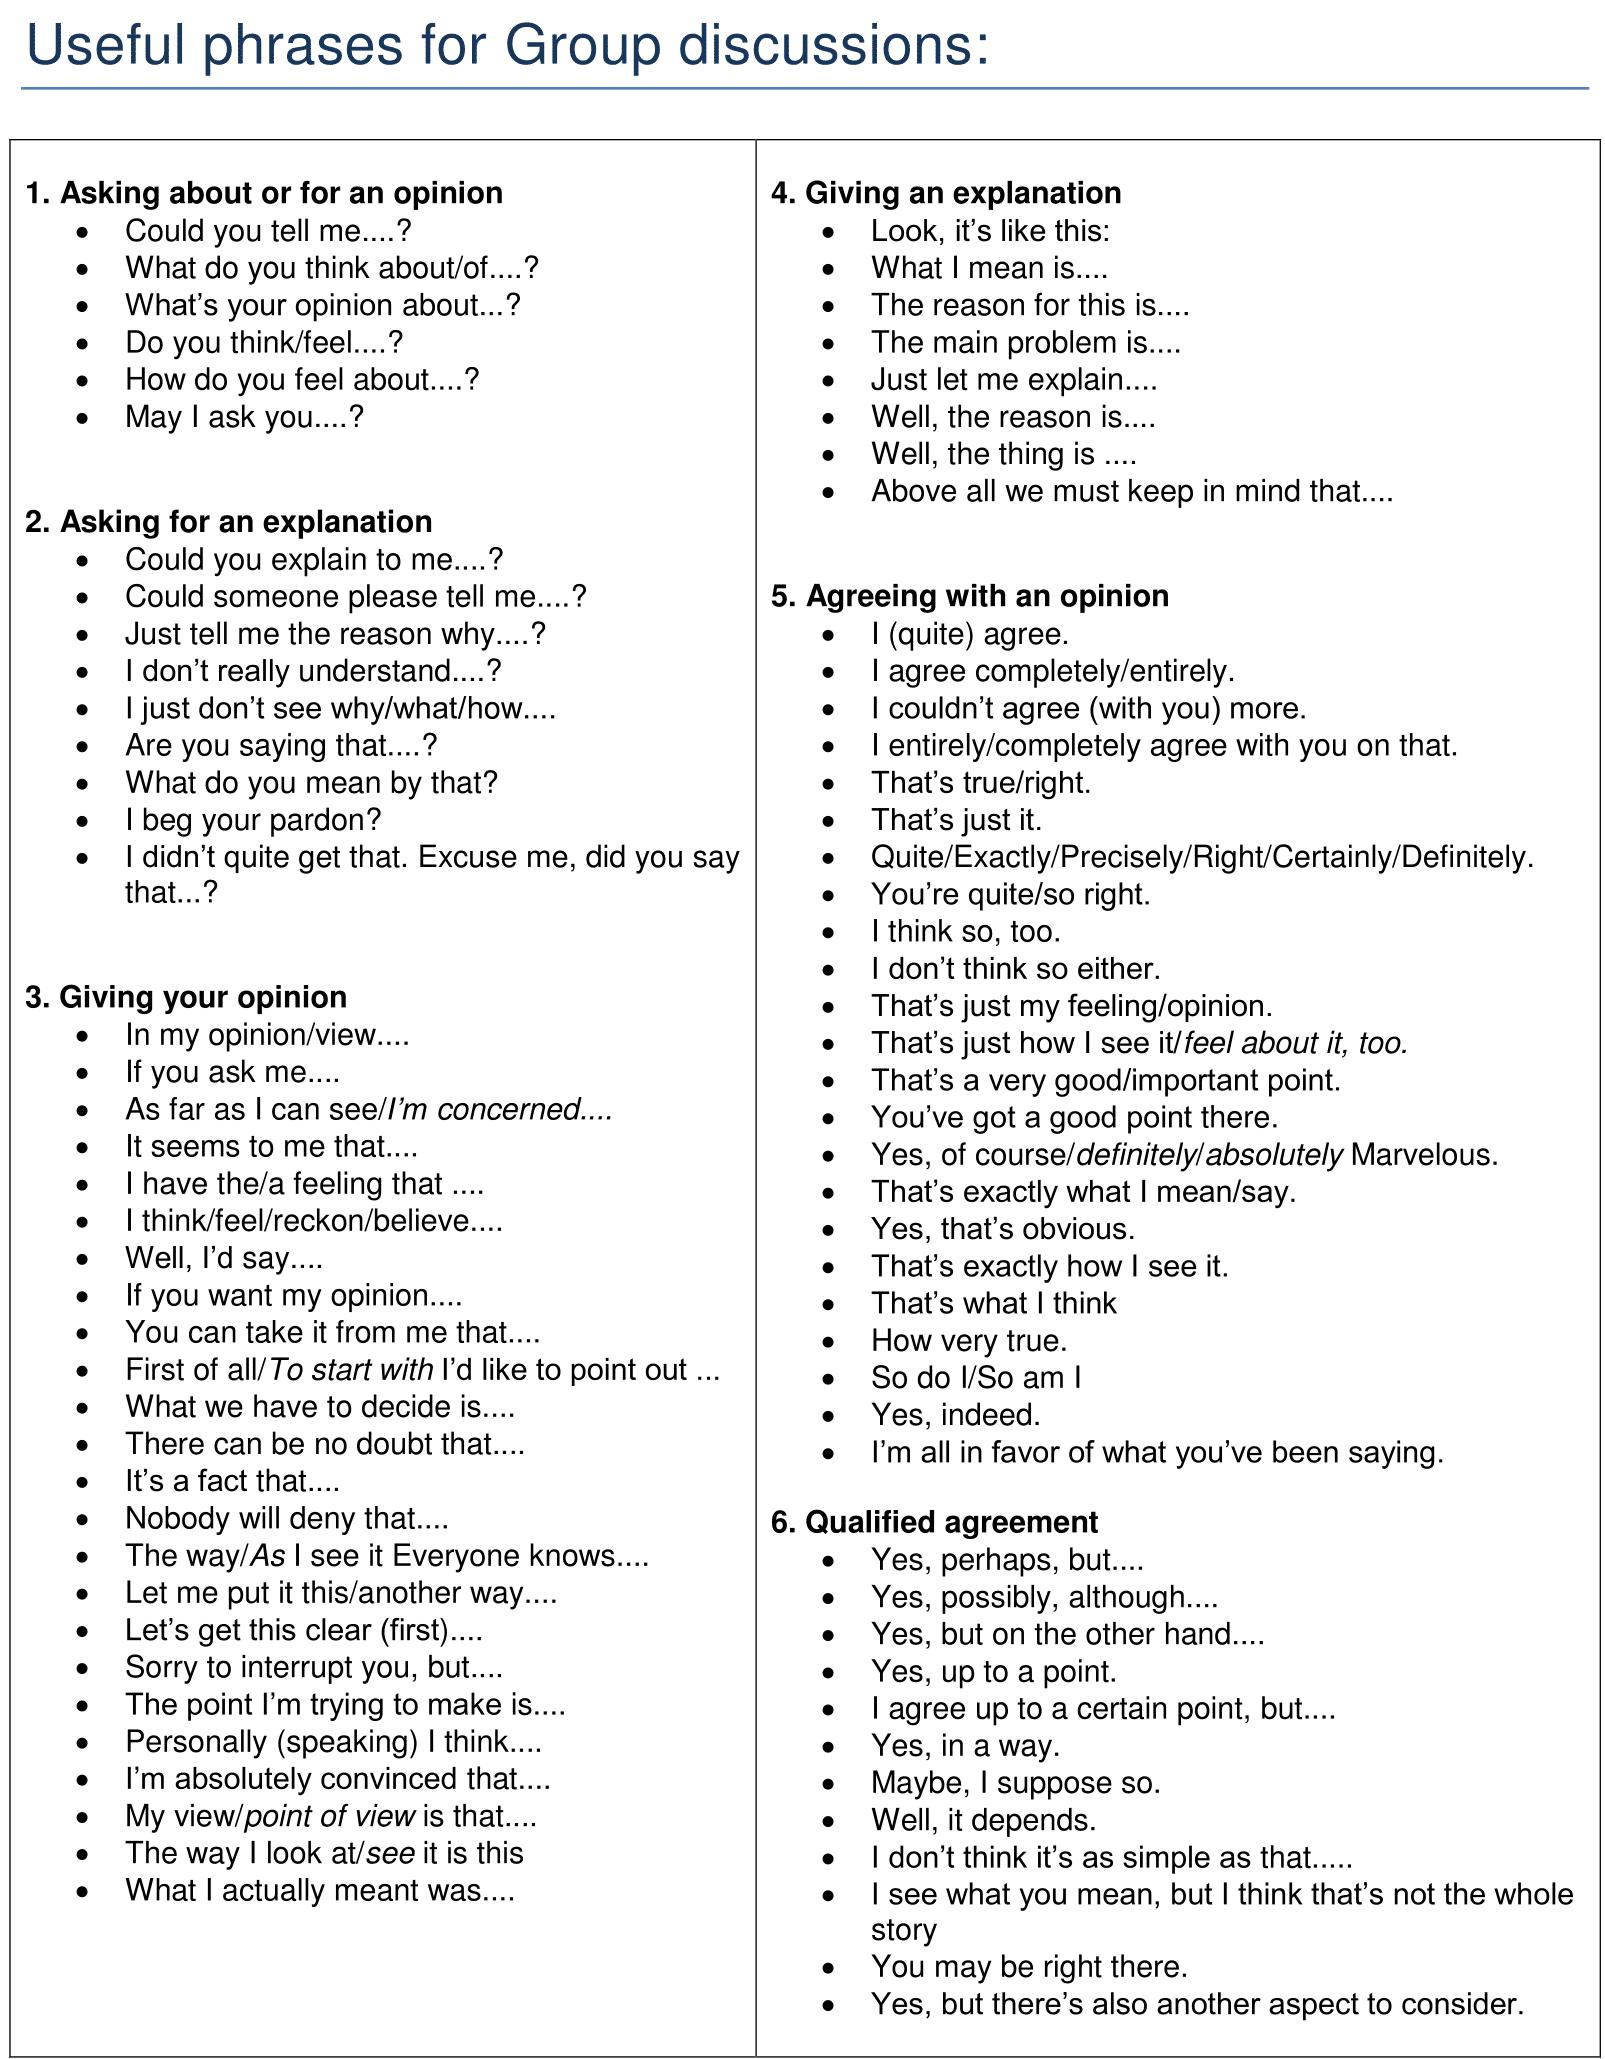 clase de latin para niños pdf